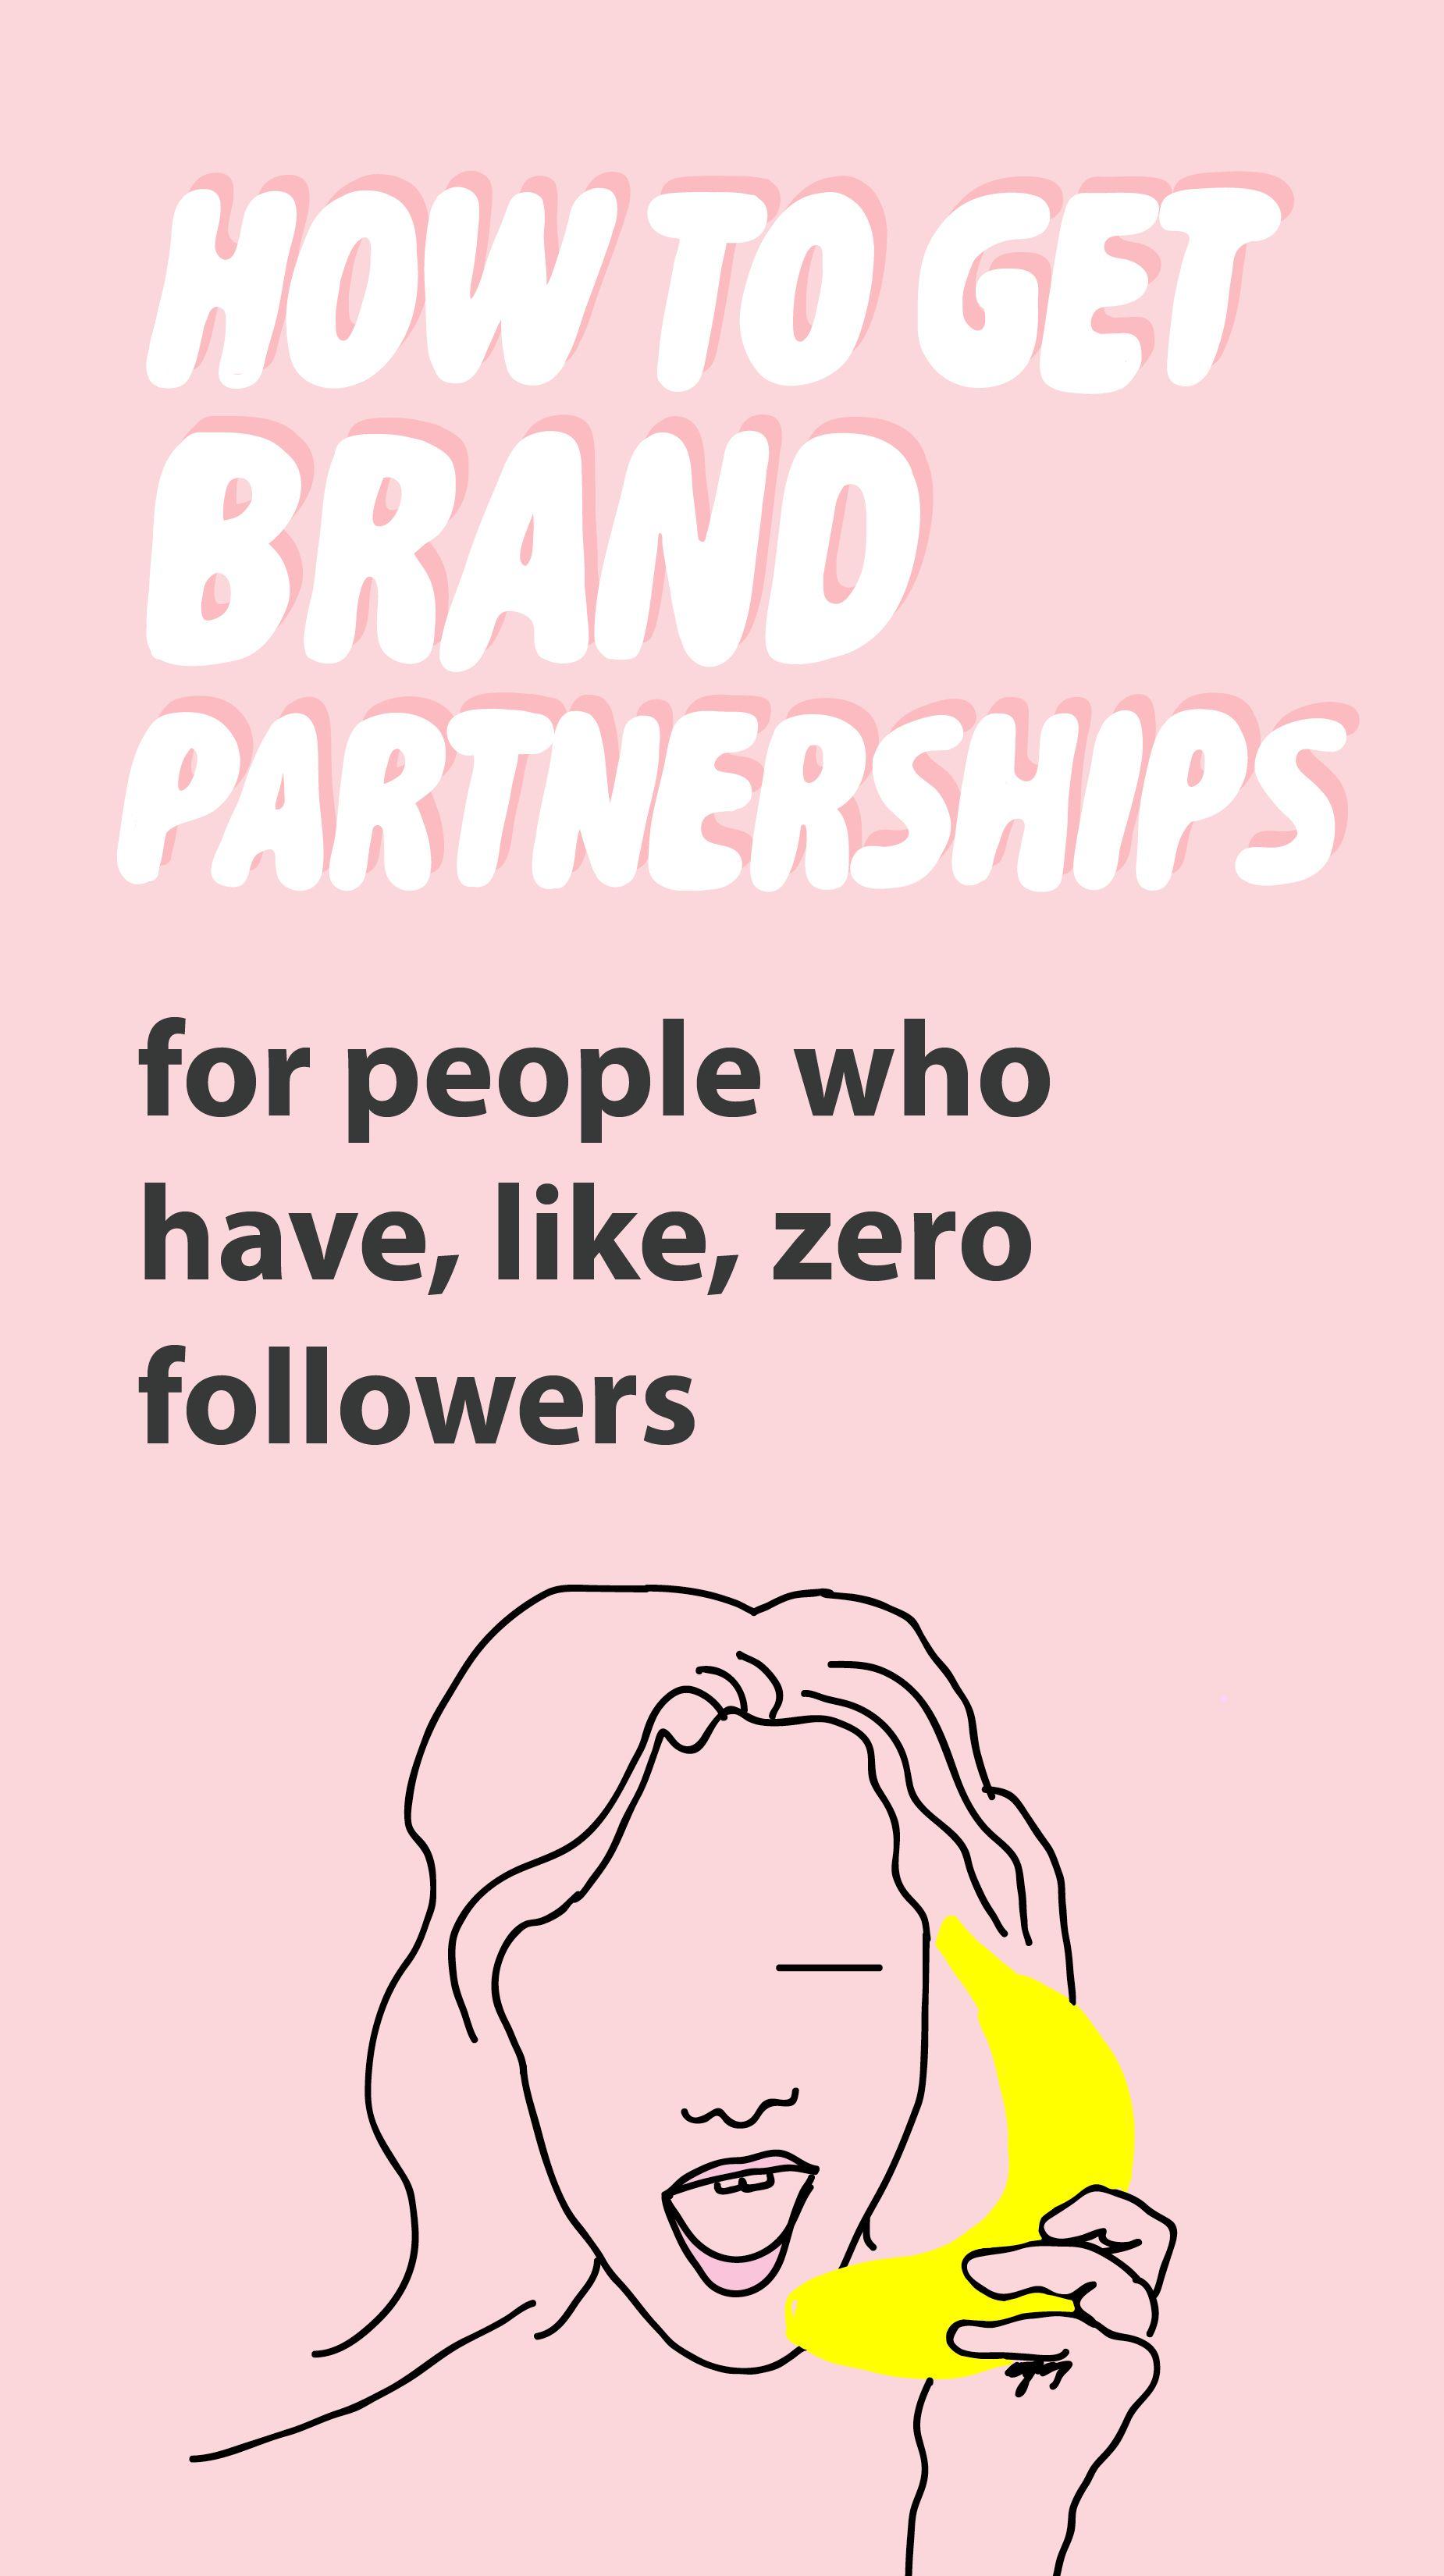 HOW TO GET BRAND PARTNERSHIPS EBook Brand partnership